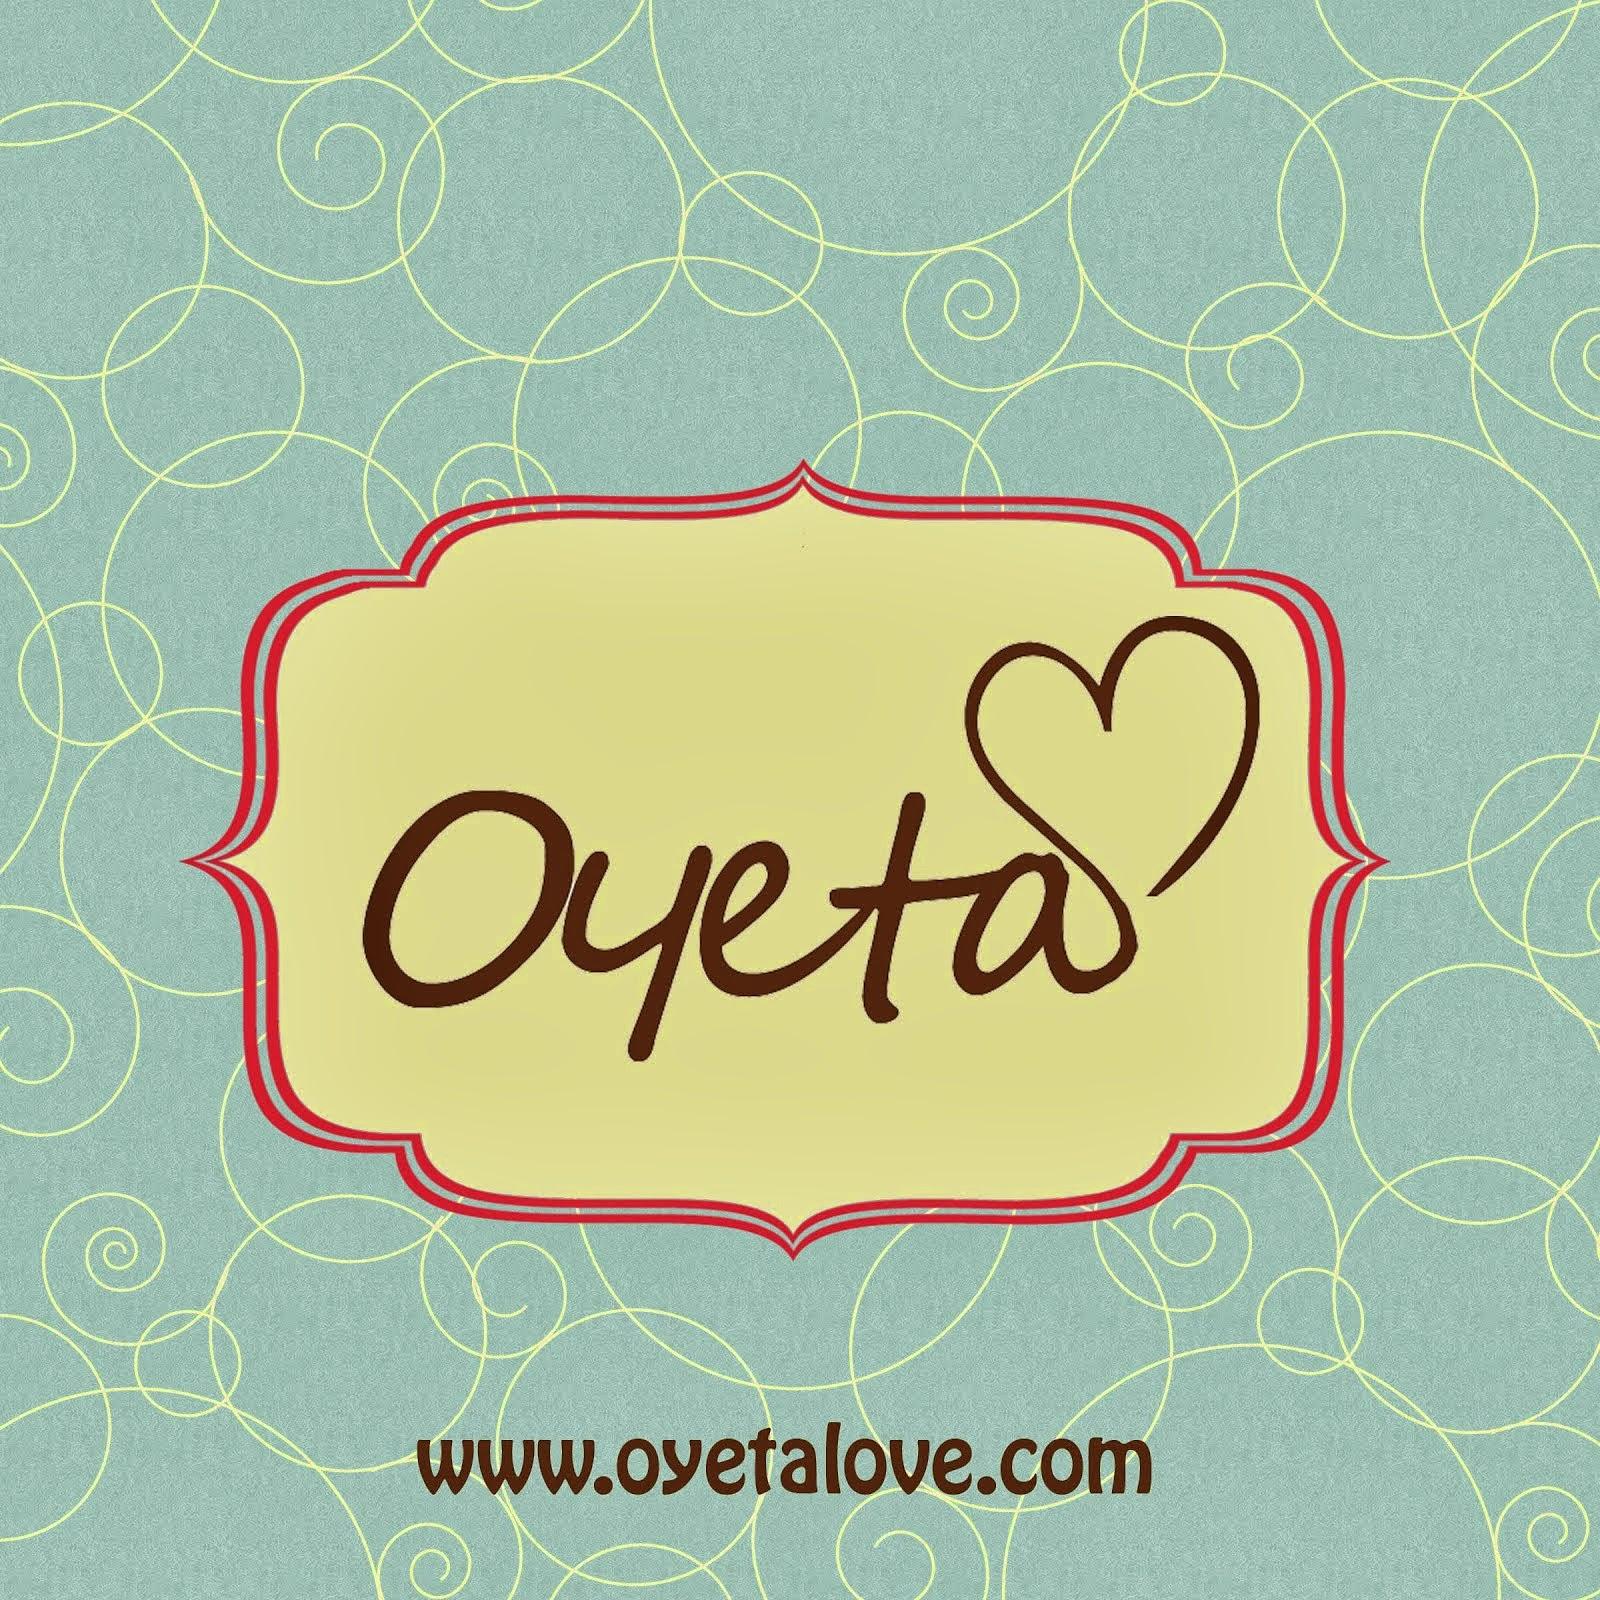 Oyetalove